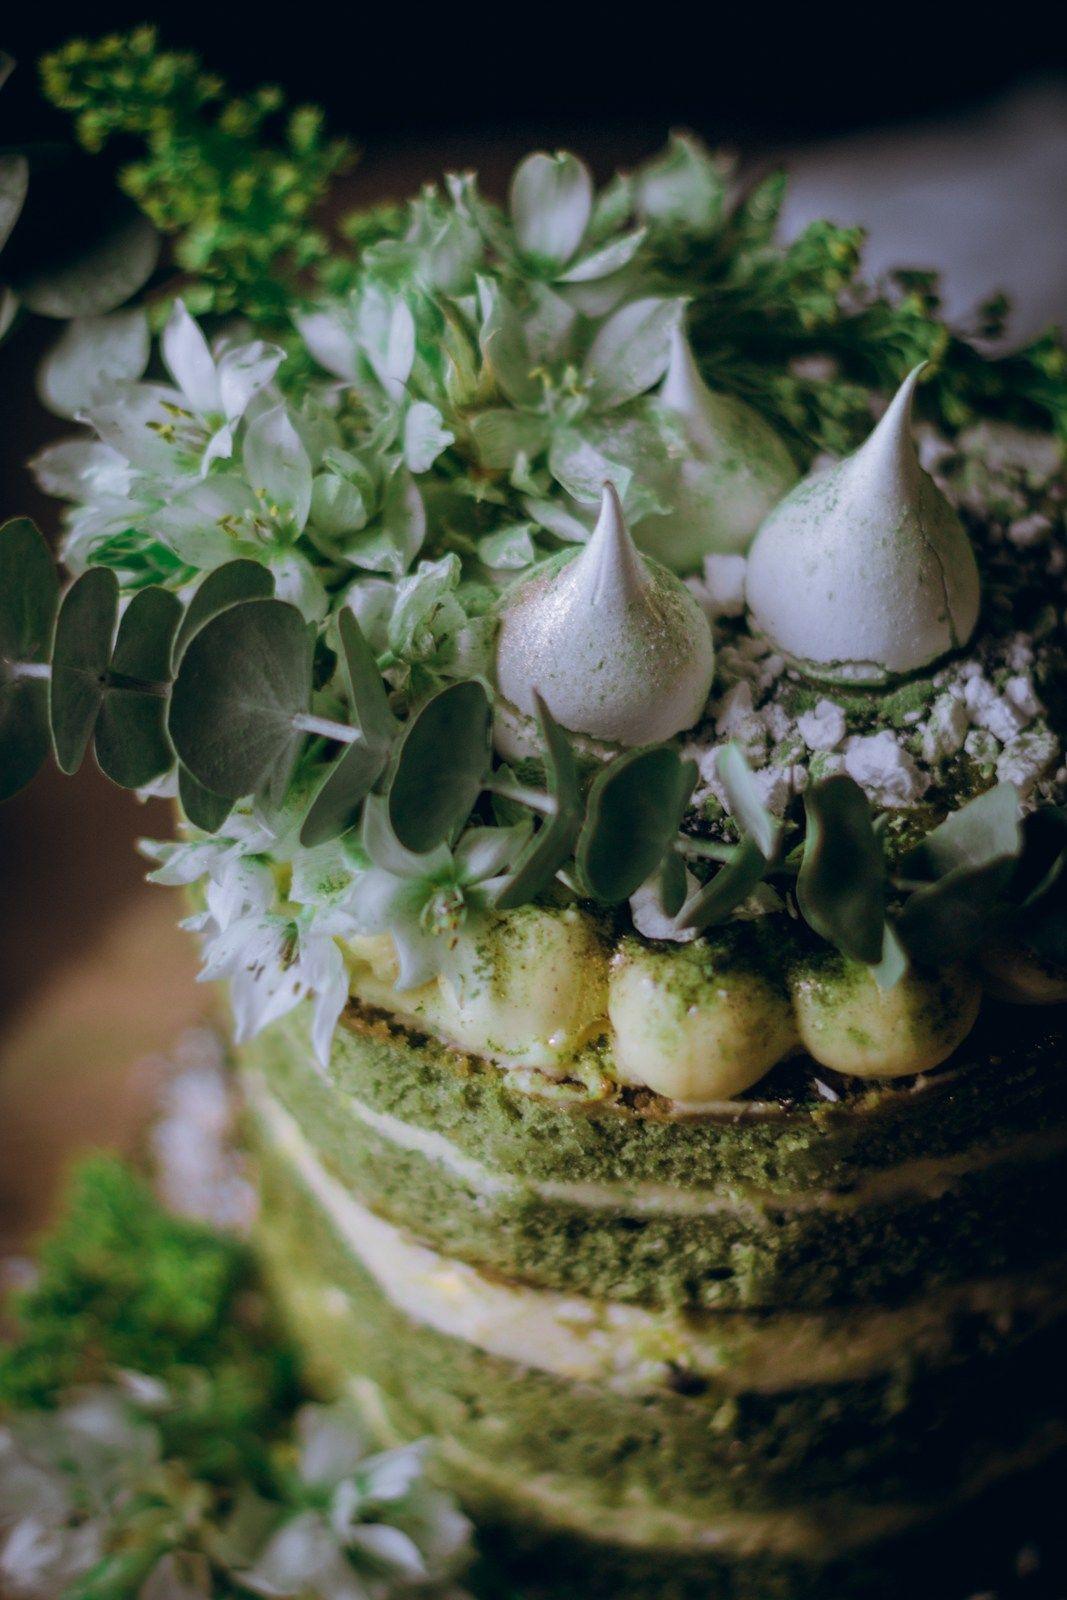 Green Velvet Matcha Green Tea Naked Cake with Passion Fruit Curd & Lemon Zest Cream Cheese Frosting | elciervo